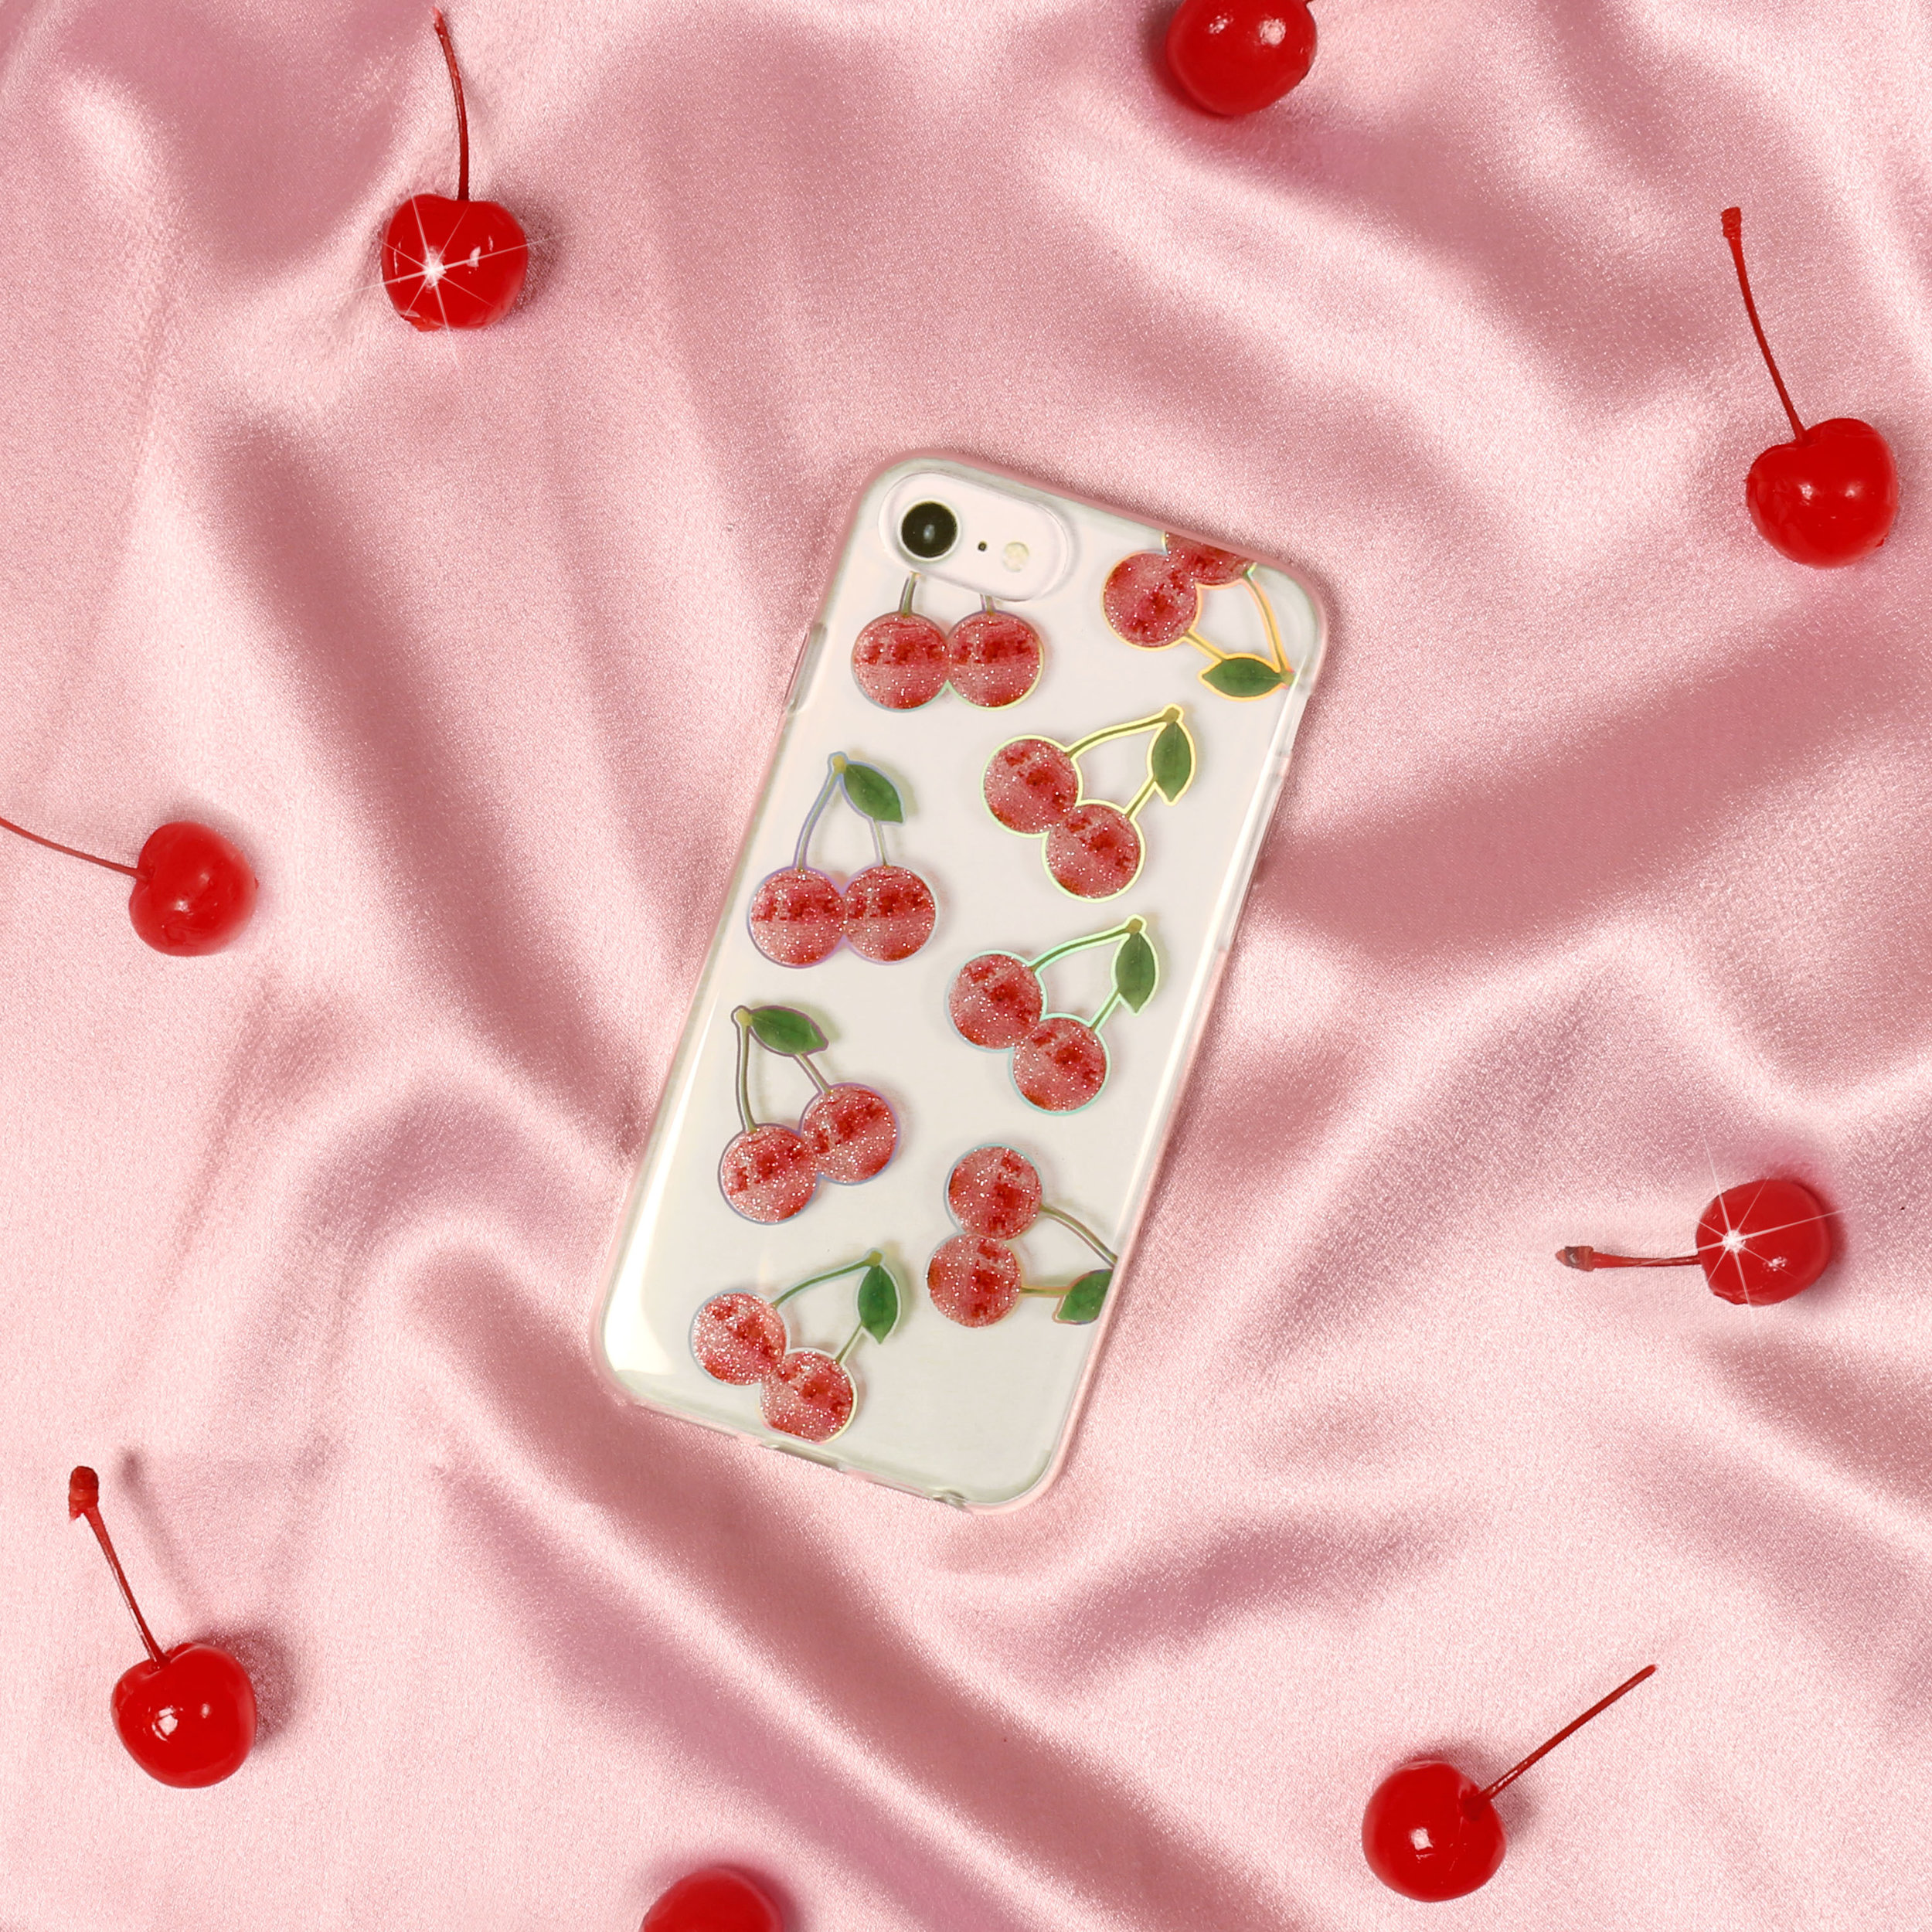 catherine-kim-urban-outfitters-iphone.jpg